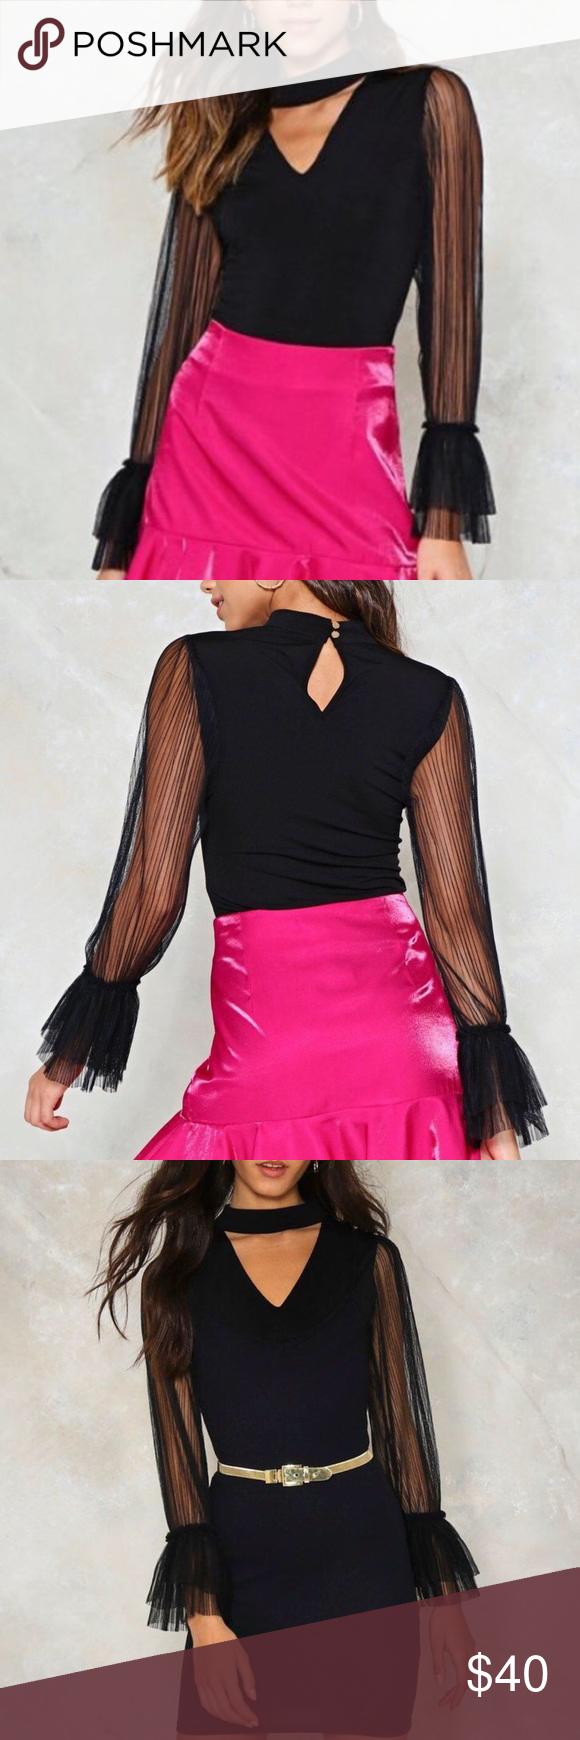 🔥NEW NASTY GAL Choker Bodysuit Sheer Mesh Sleeves PRICE IS FIRM🔒BRAND-NEW 48f5aa31e